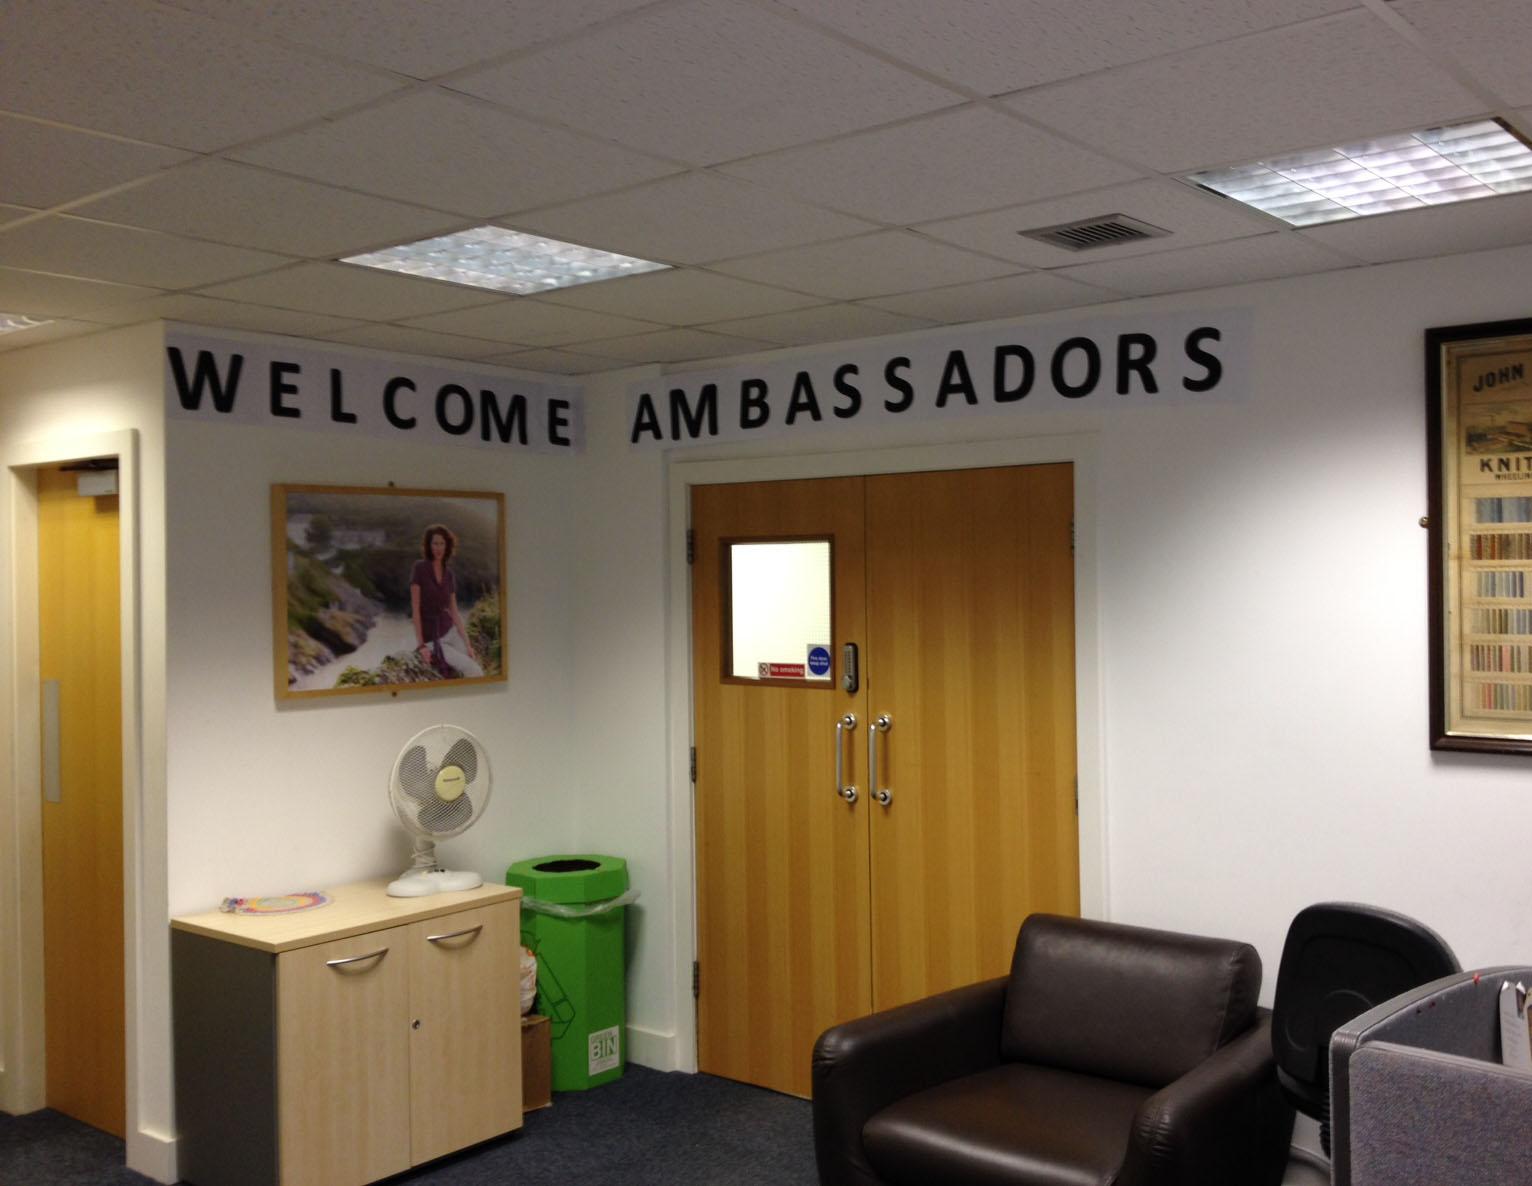 WelcomeAmbassadors